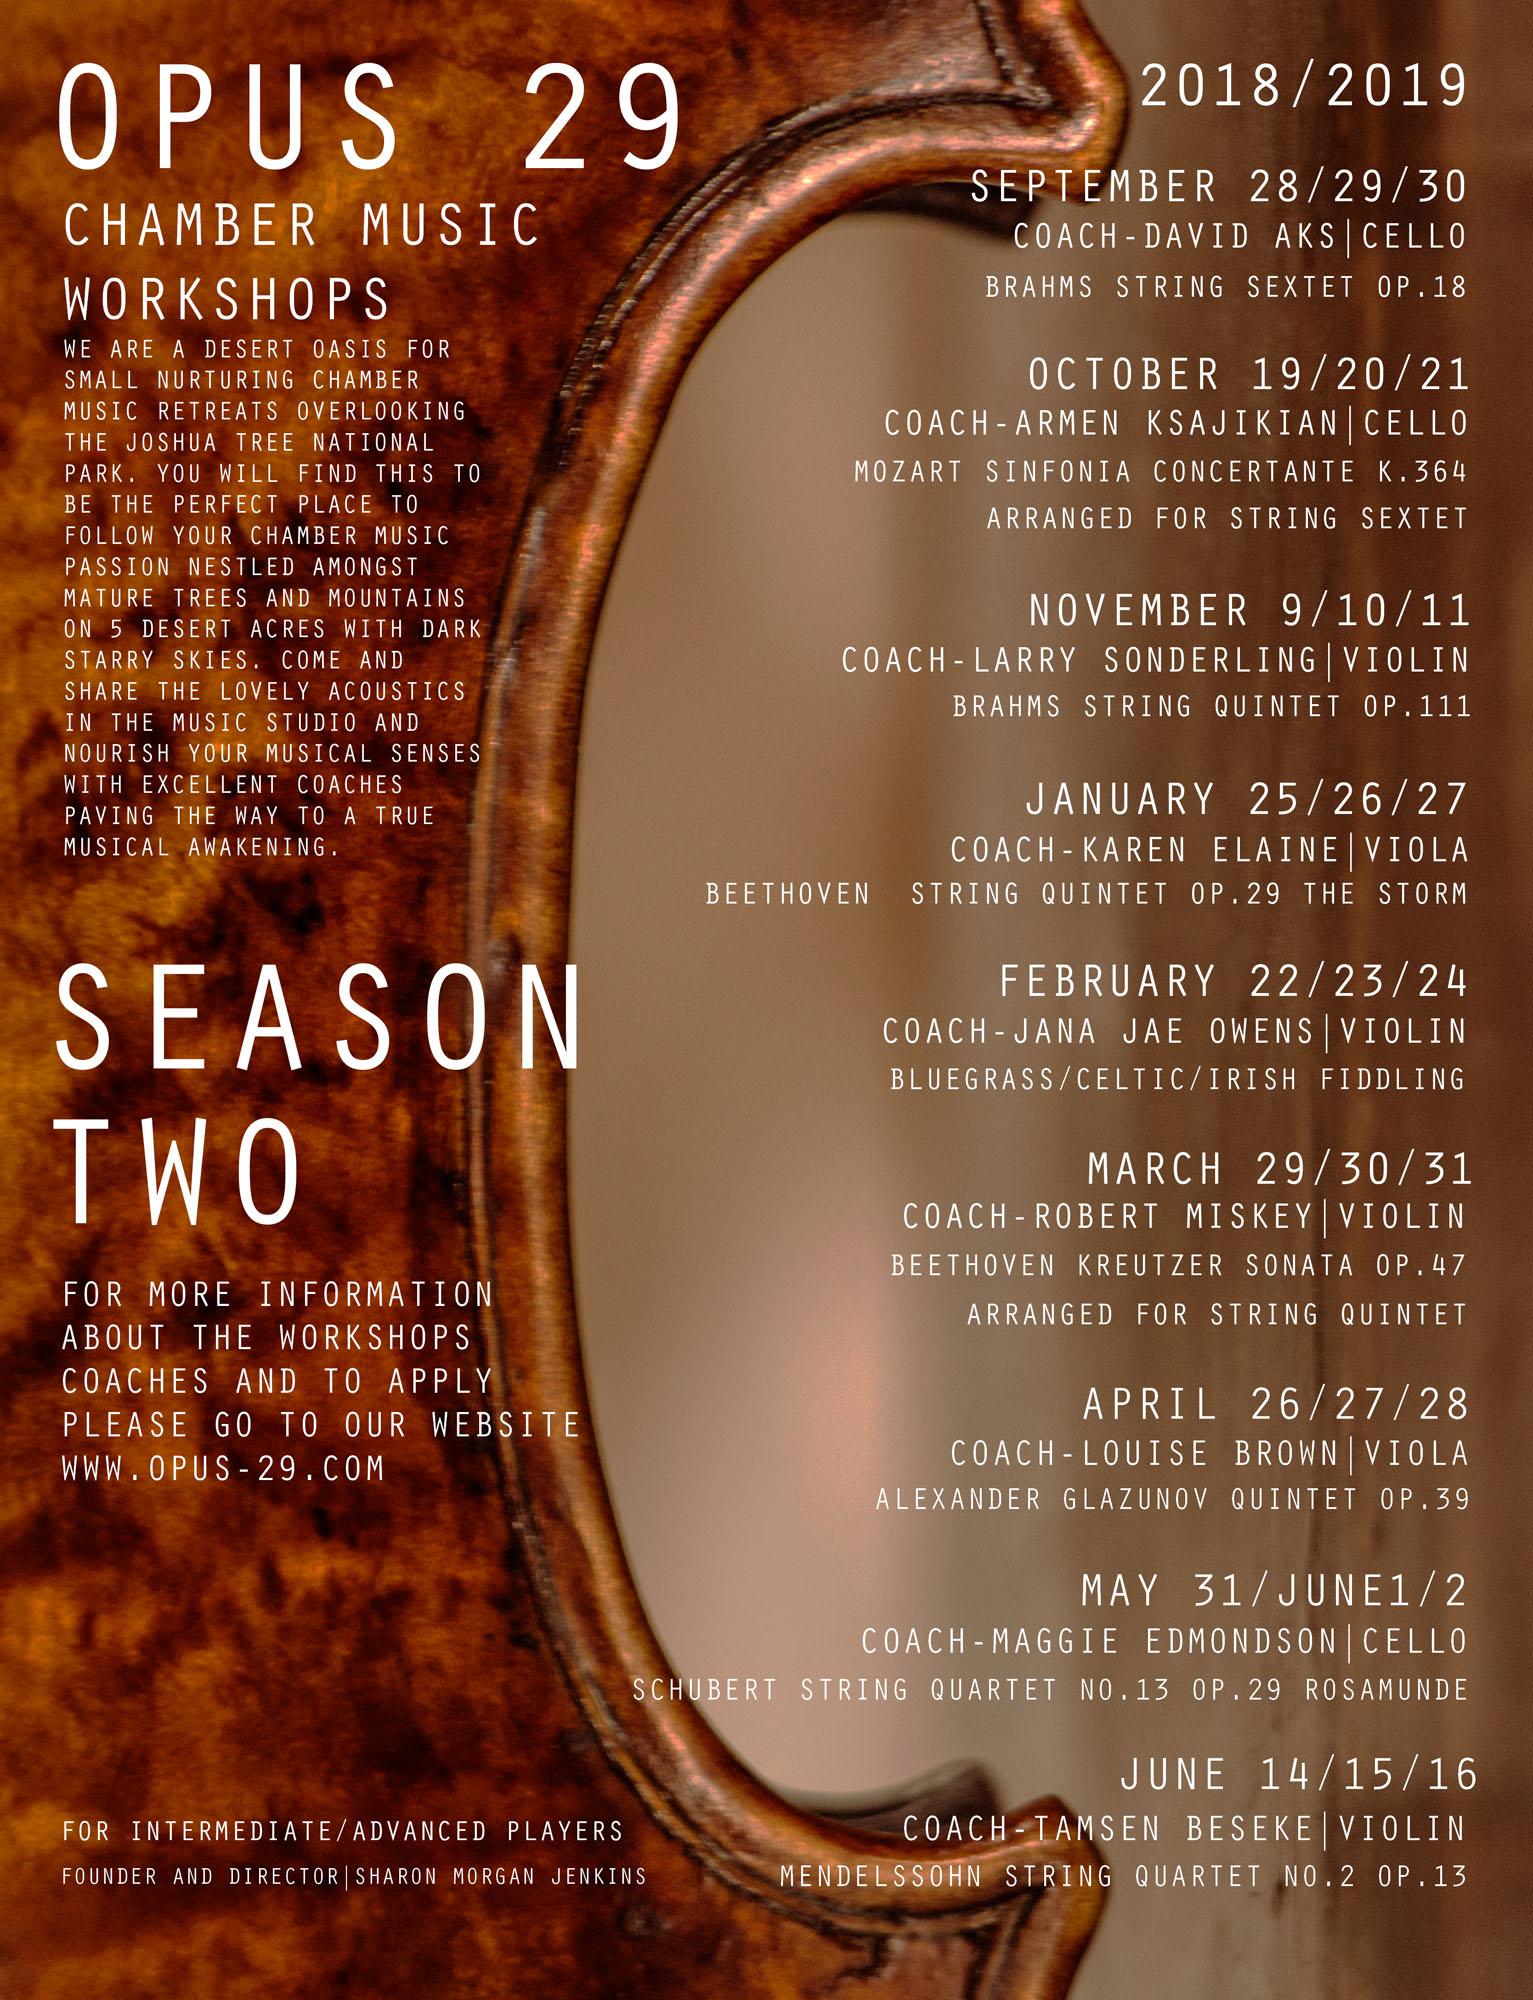 OPUS-29 season 2 flyer.jpg